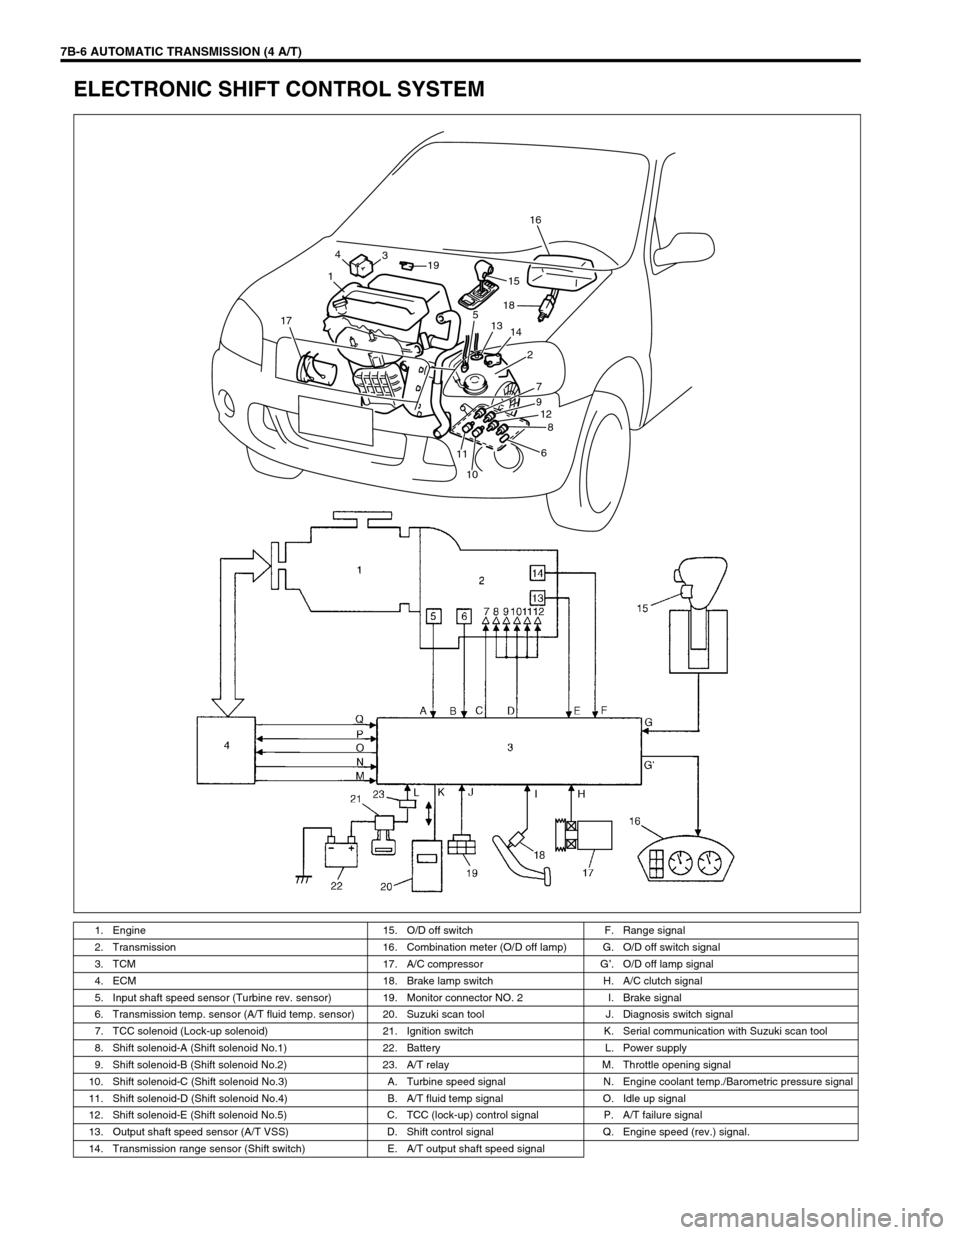 hight resolution of suzuki swift 2000 1 g transmission service workshop manual page 48